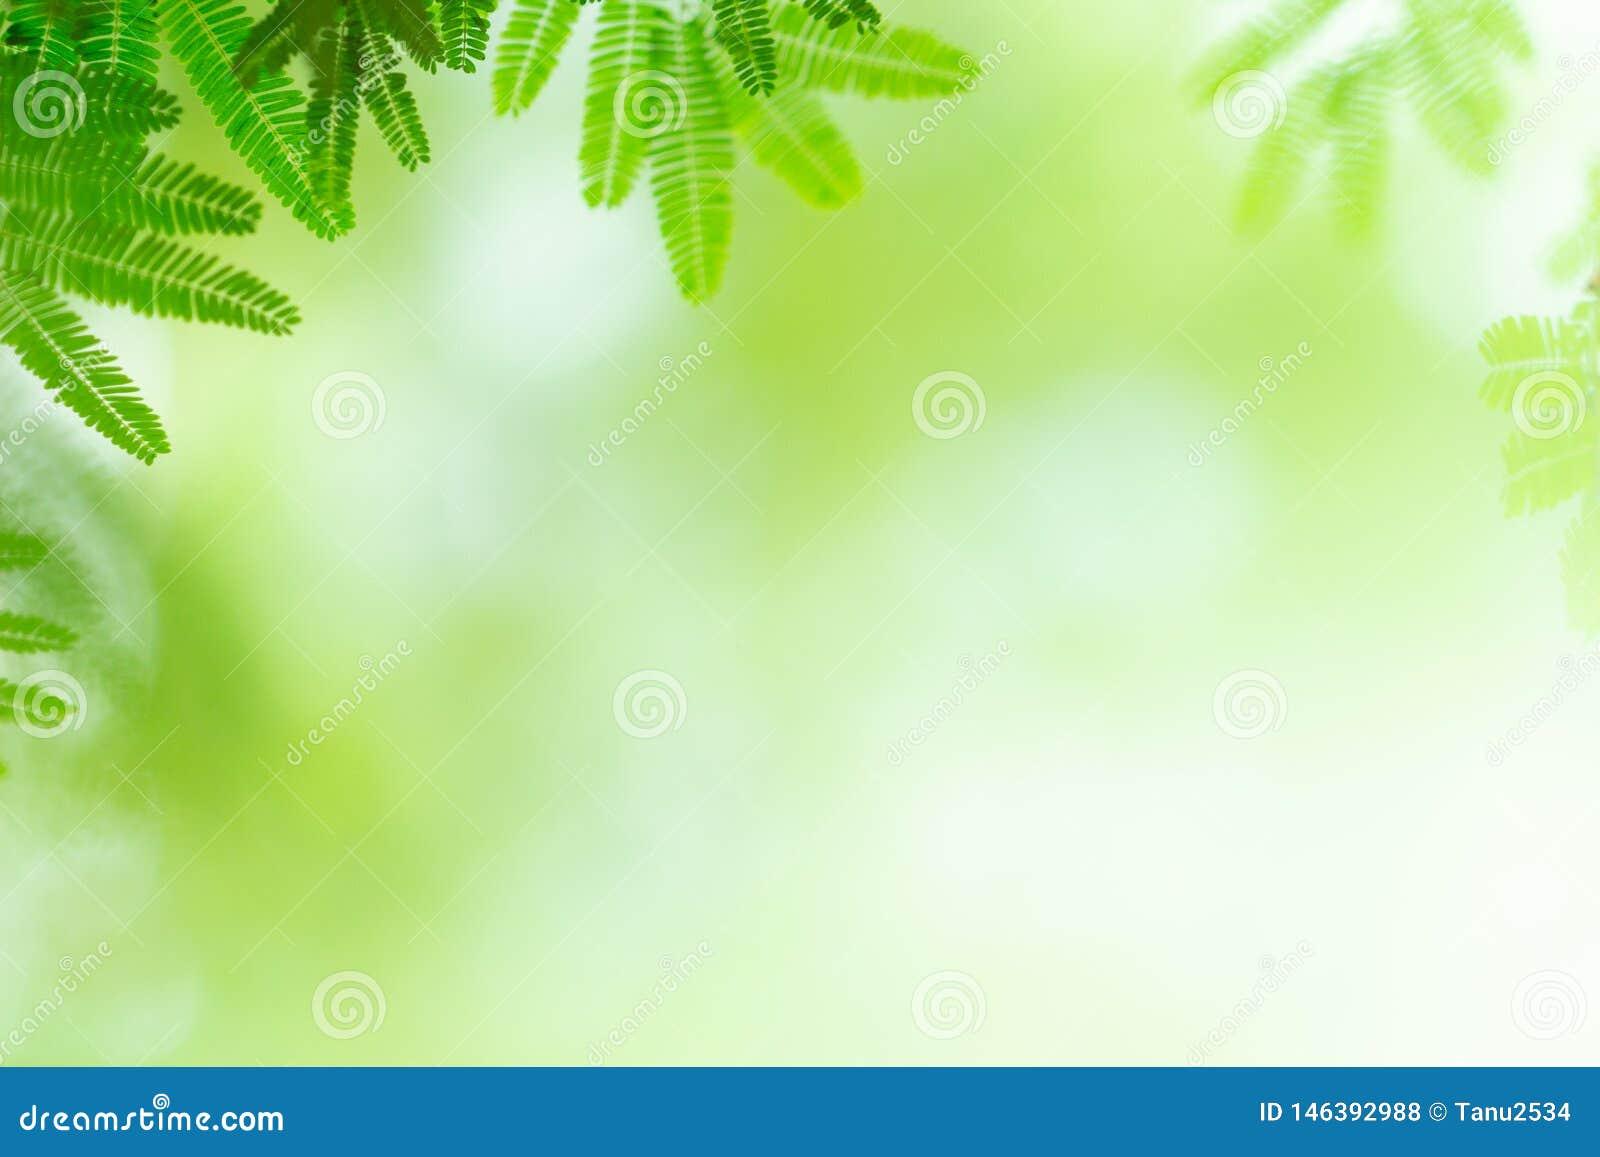 Green leaf on blurred greenery background. Beautiful leaf texture in nature.